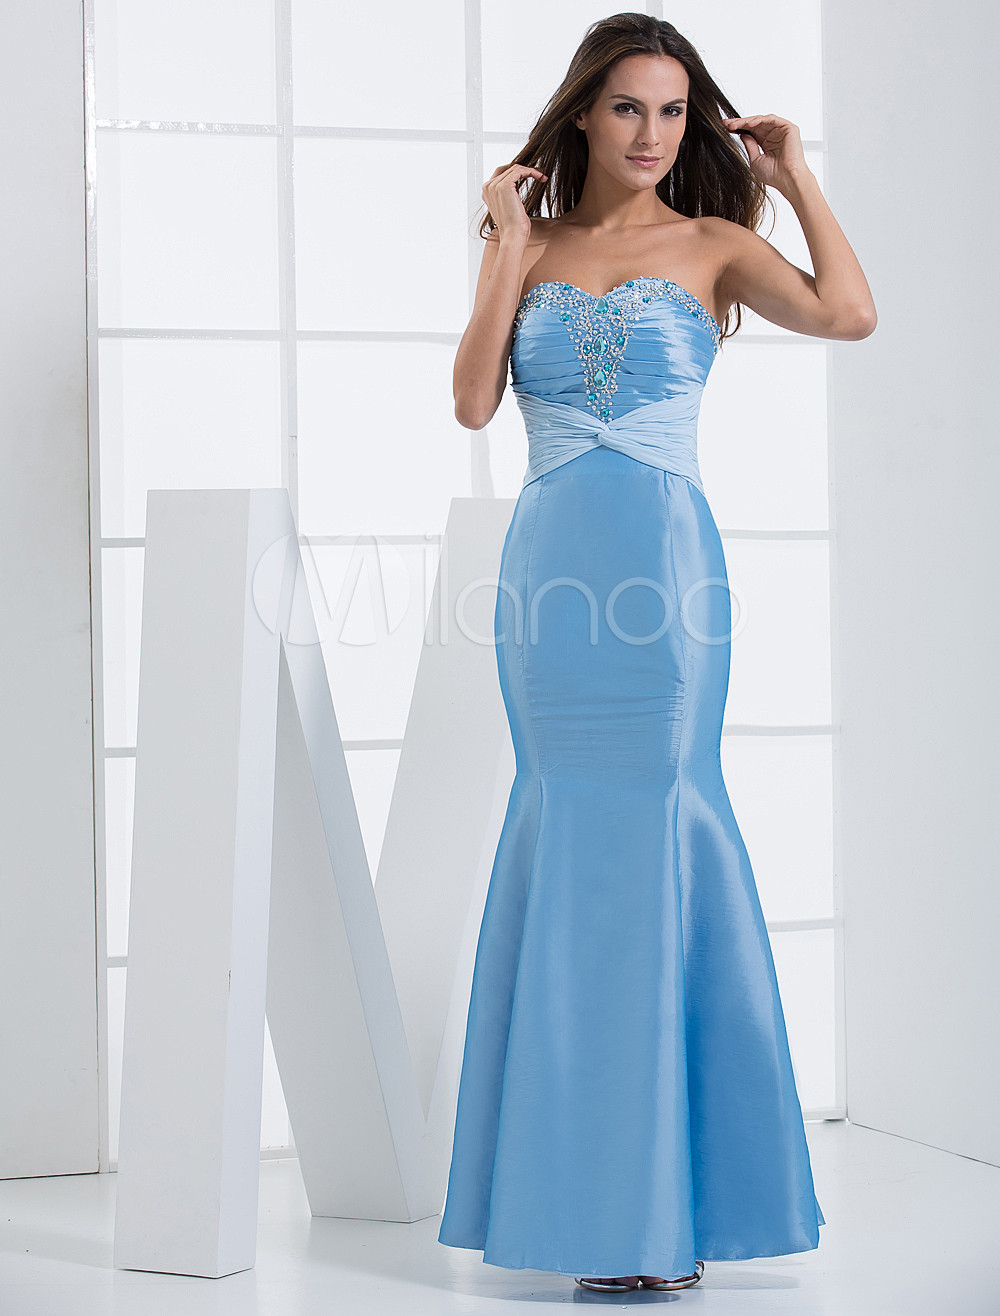 Mermaid Light Sky Blue Taffeta Studded Sweetheart Neck Bridesmaid Dress